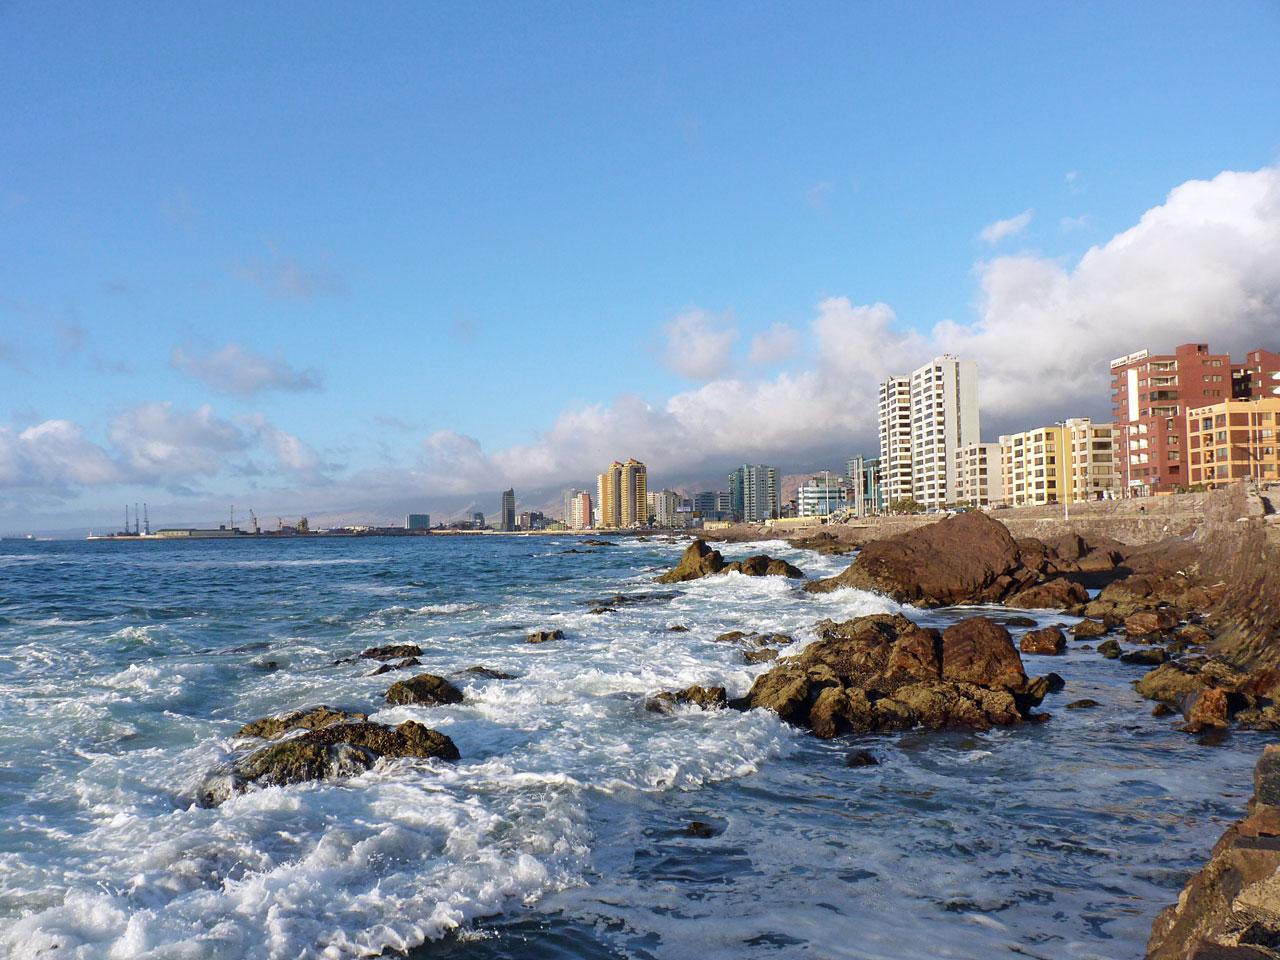 Antofagasta Chile  City pictures : ... antofagasta chile monumento de cobre costanera antofagasta chile